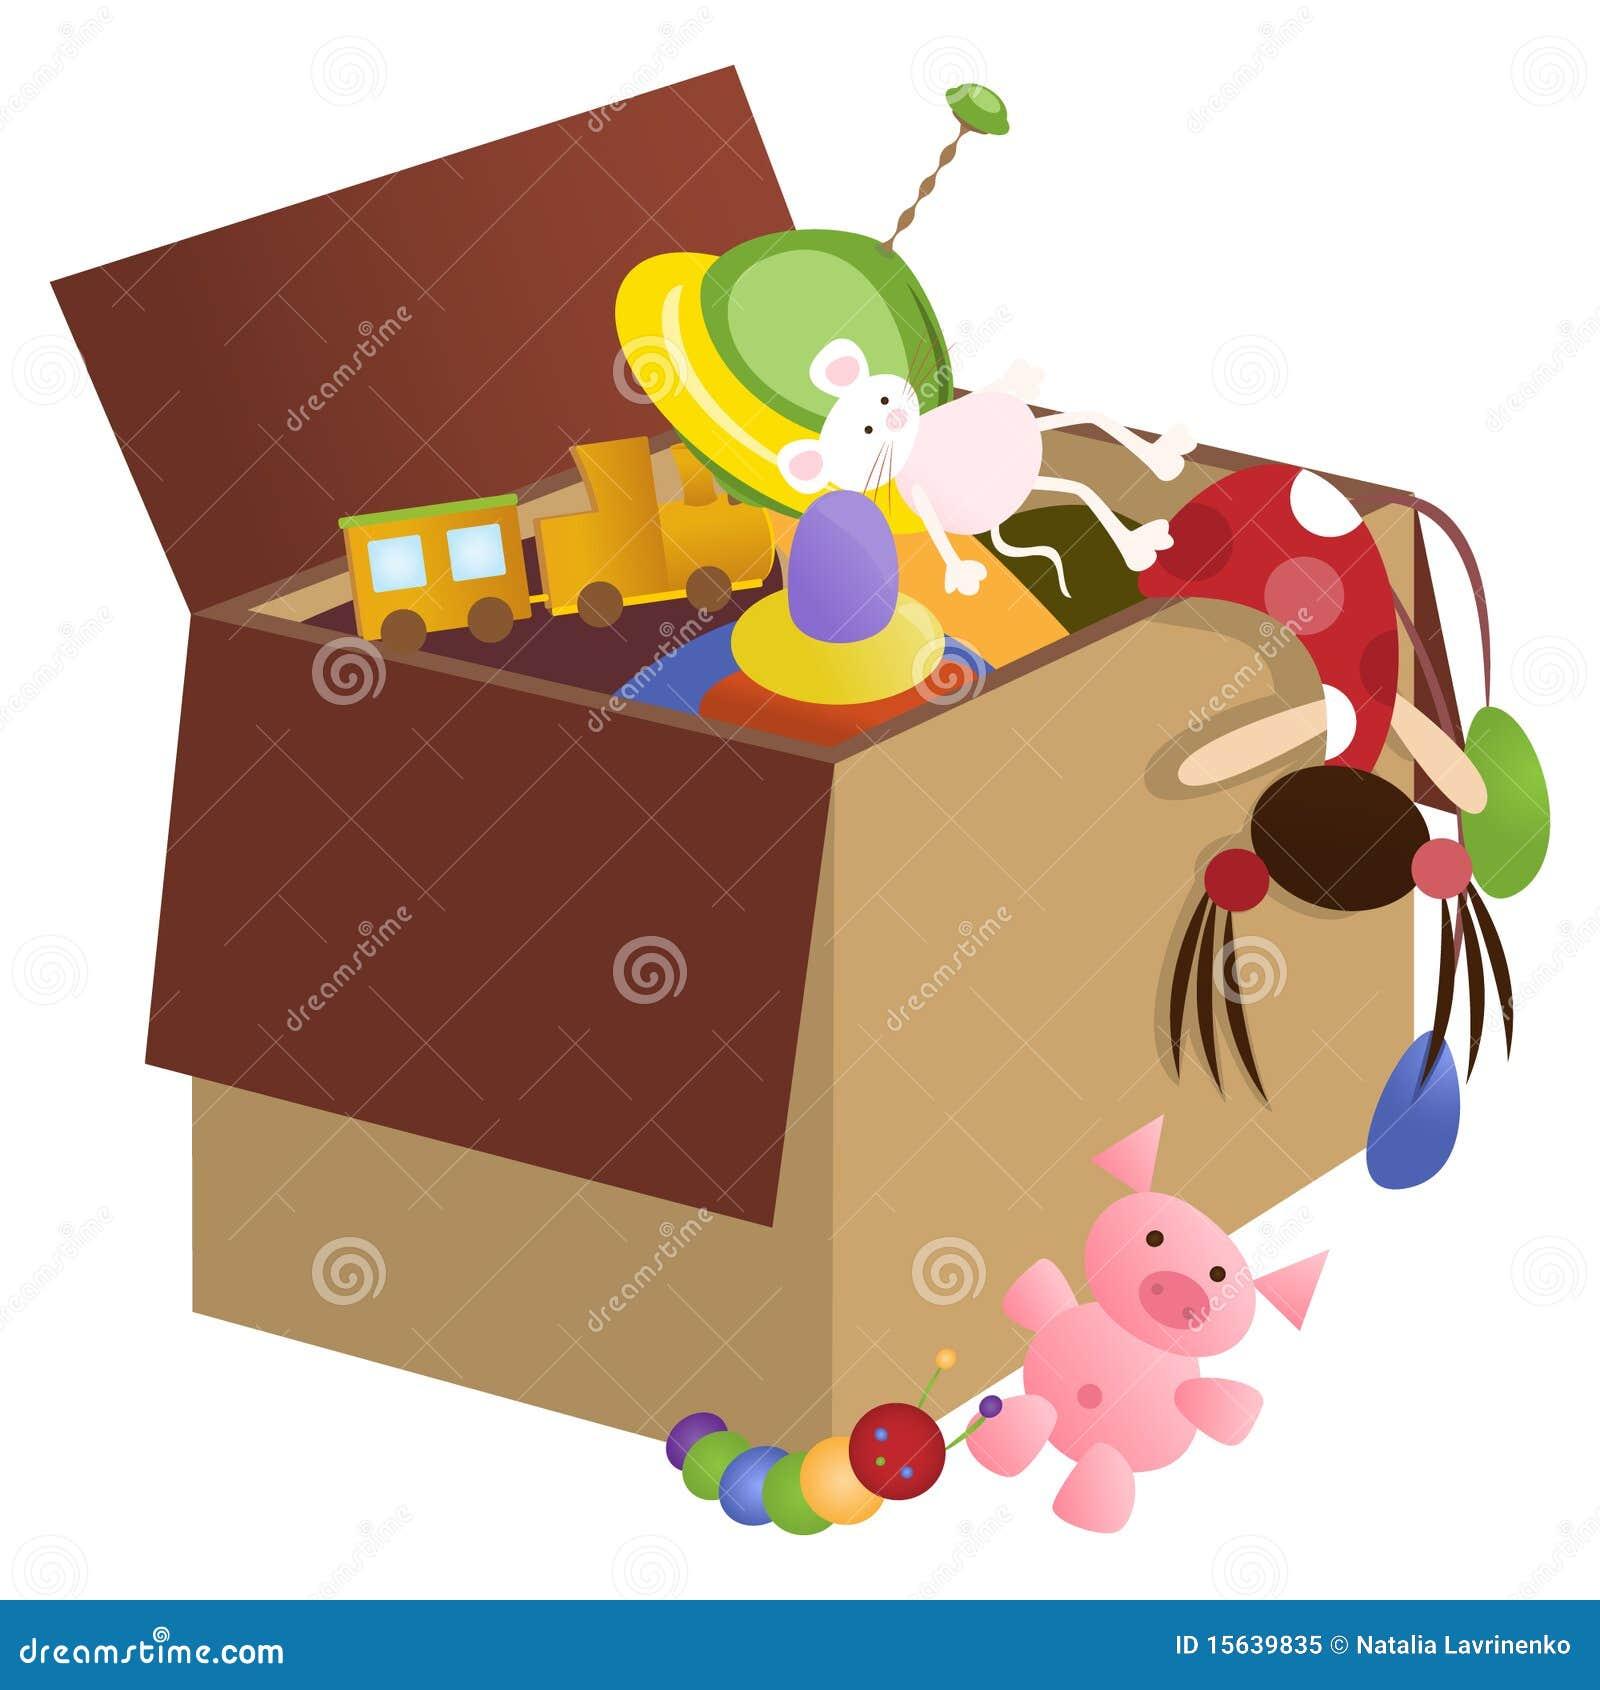 Toy Box Royalty Free Stock Photo Image 15639835